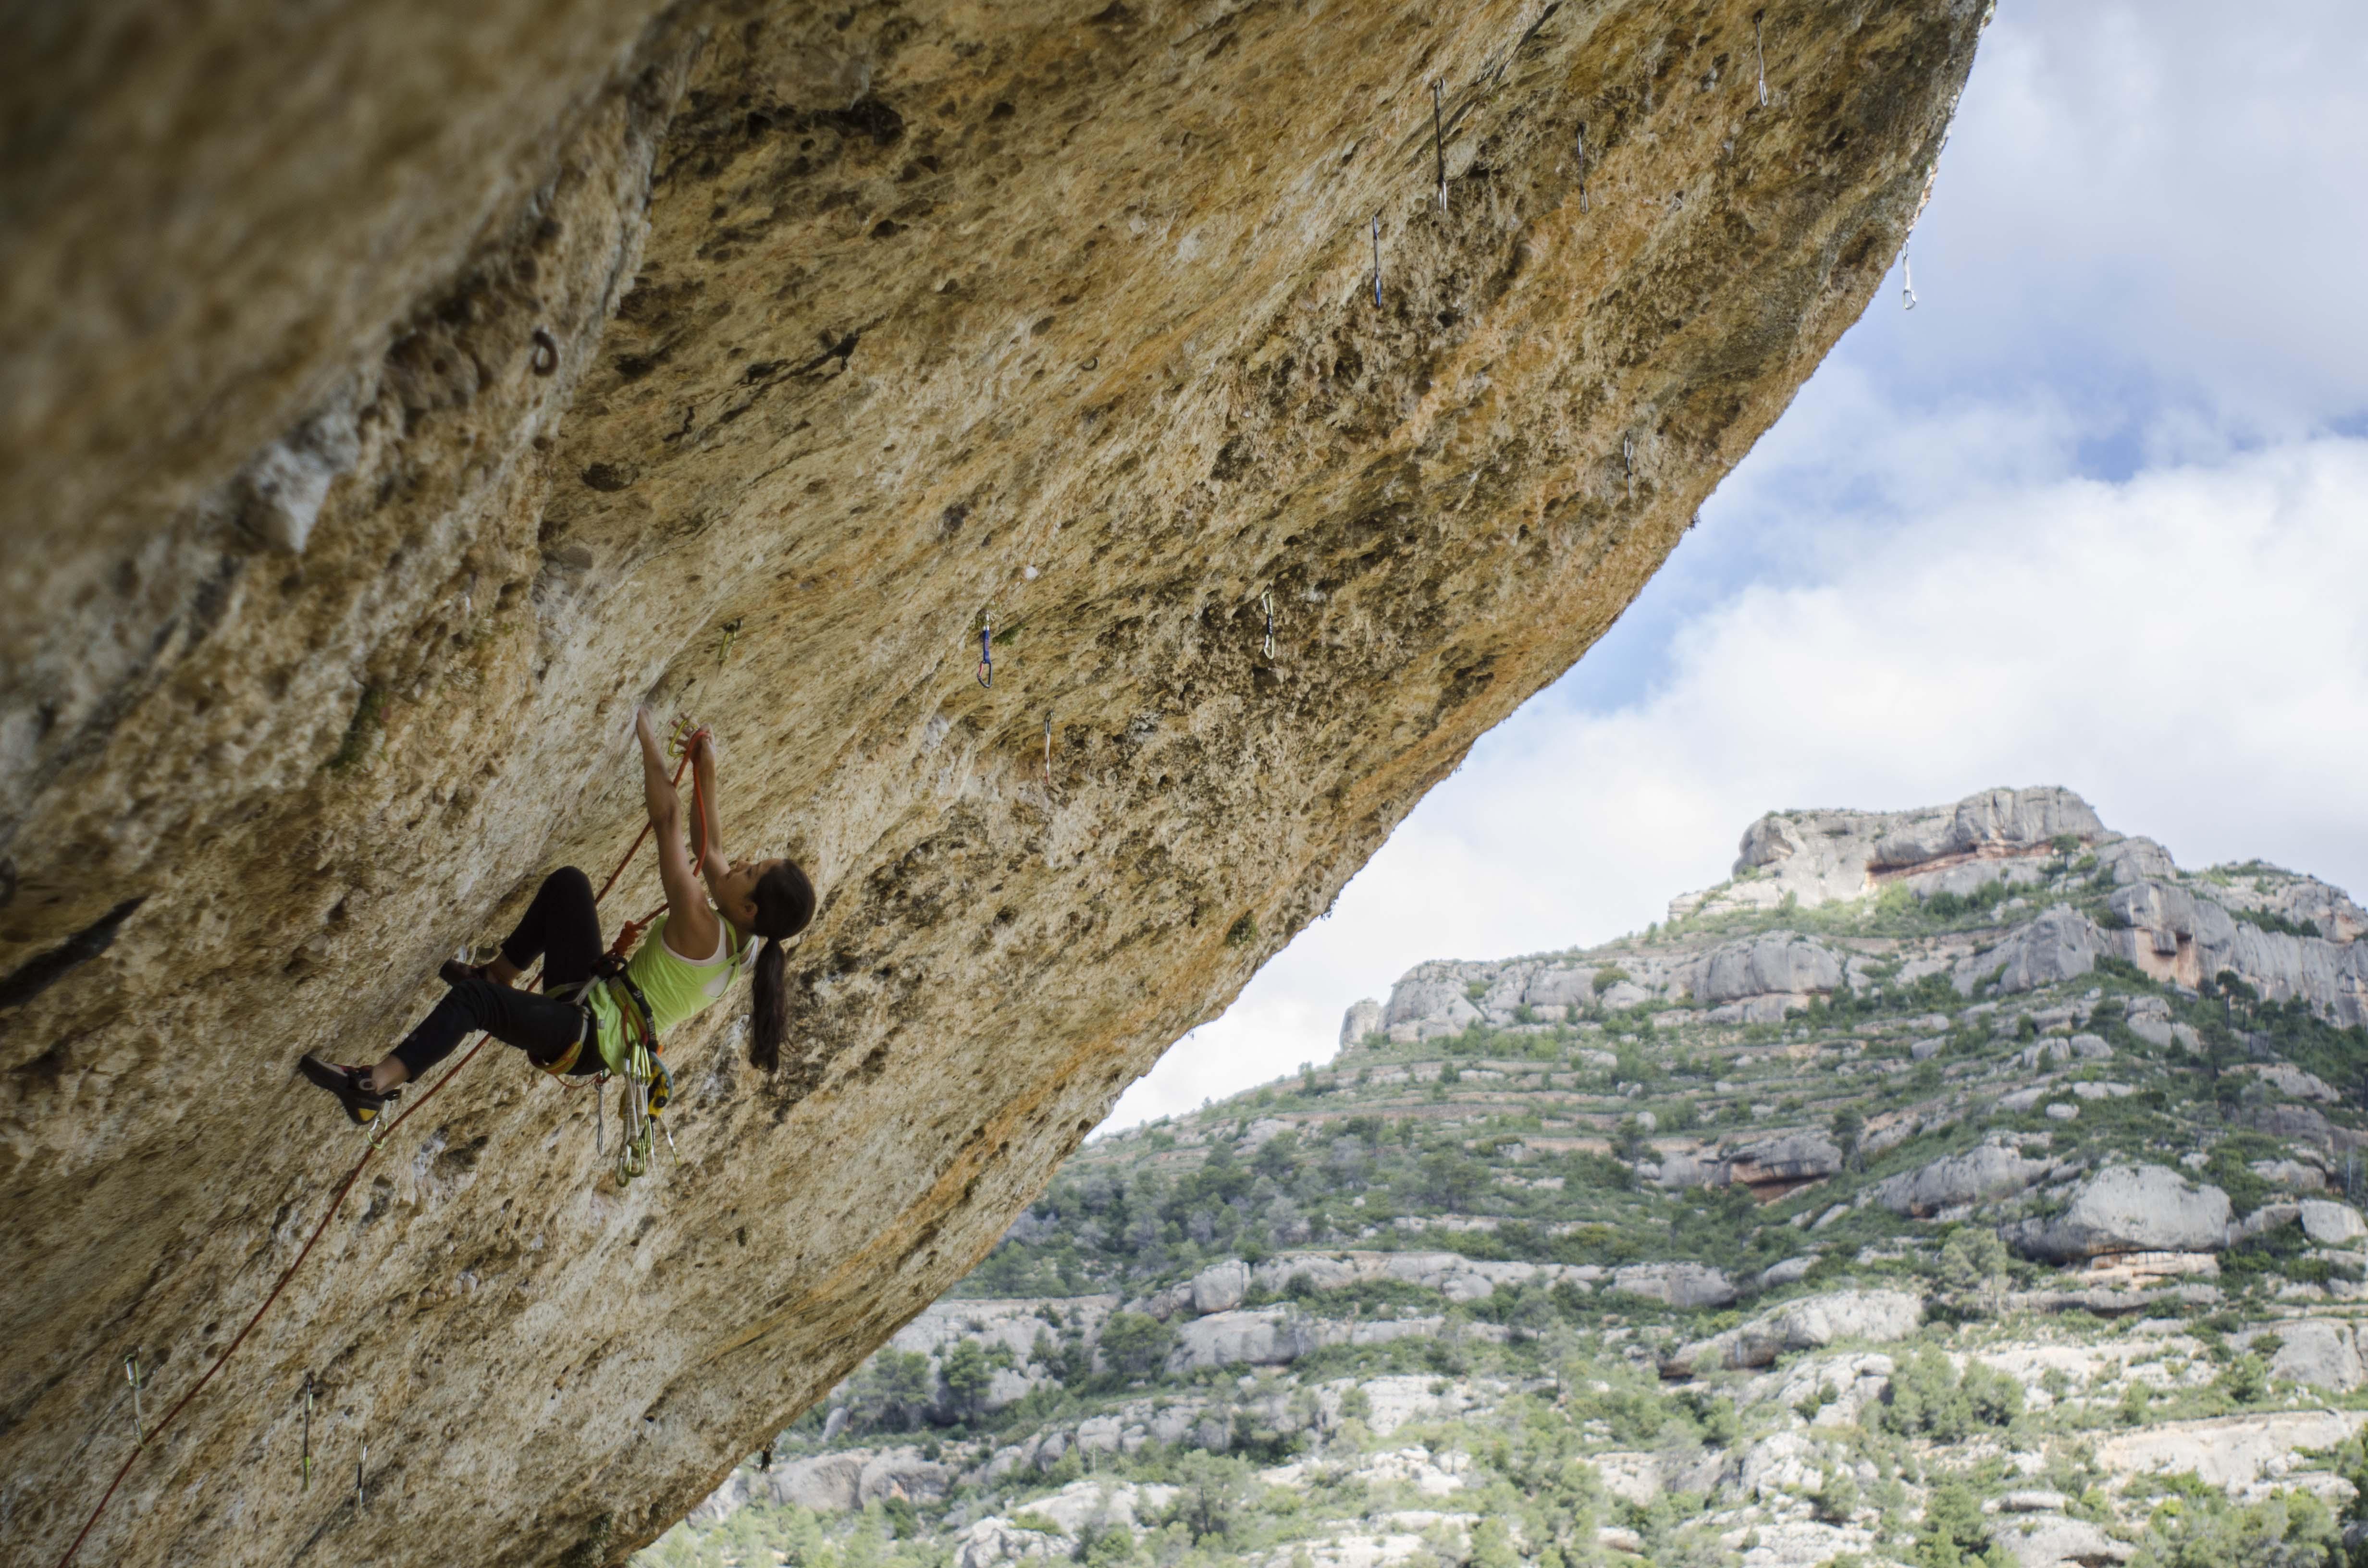 The North Face: Angie Scarth-Johnson sending L'Espiademonis 8c, Margalef (Spain).